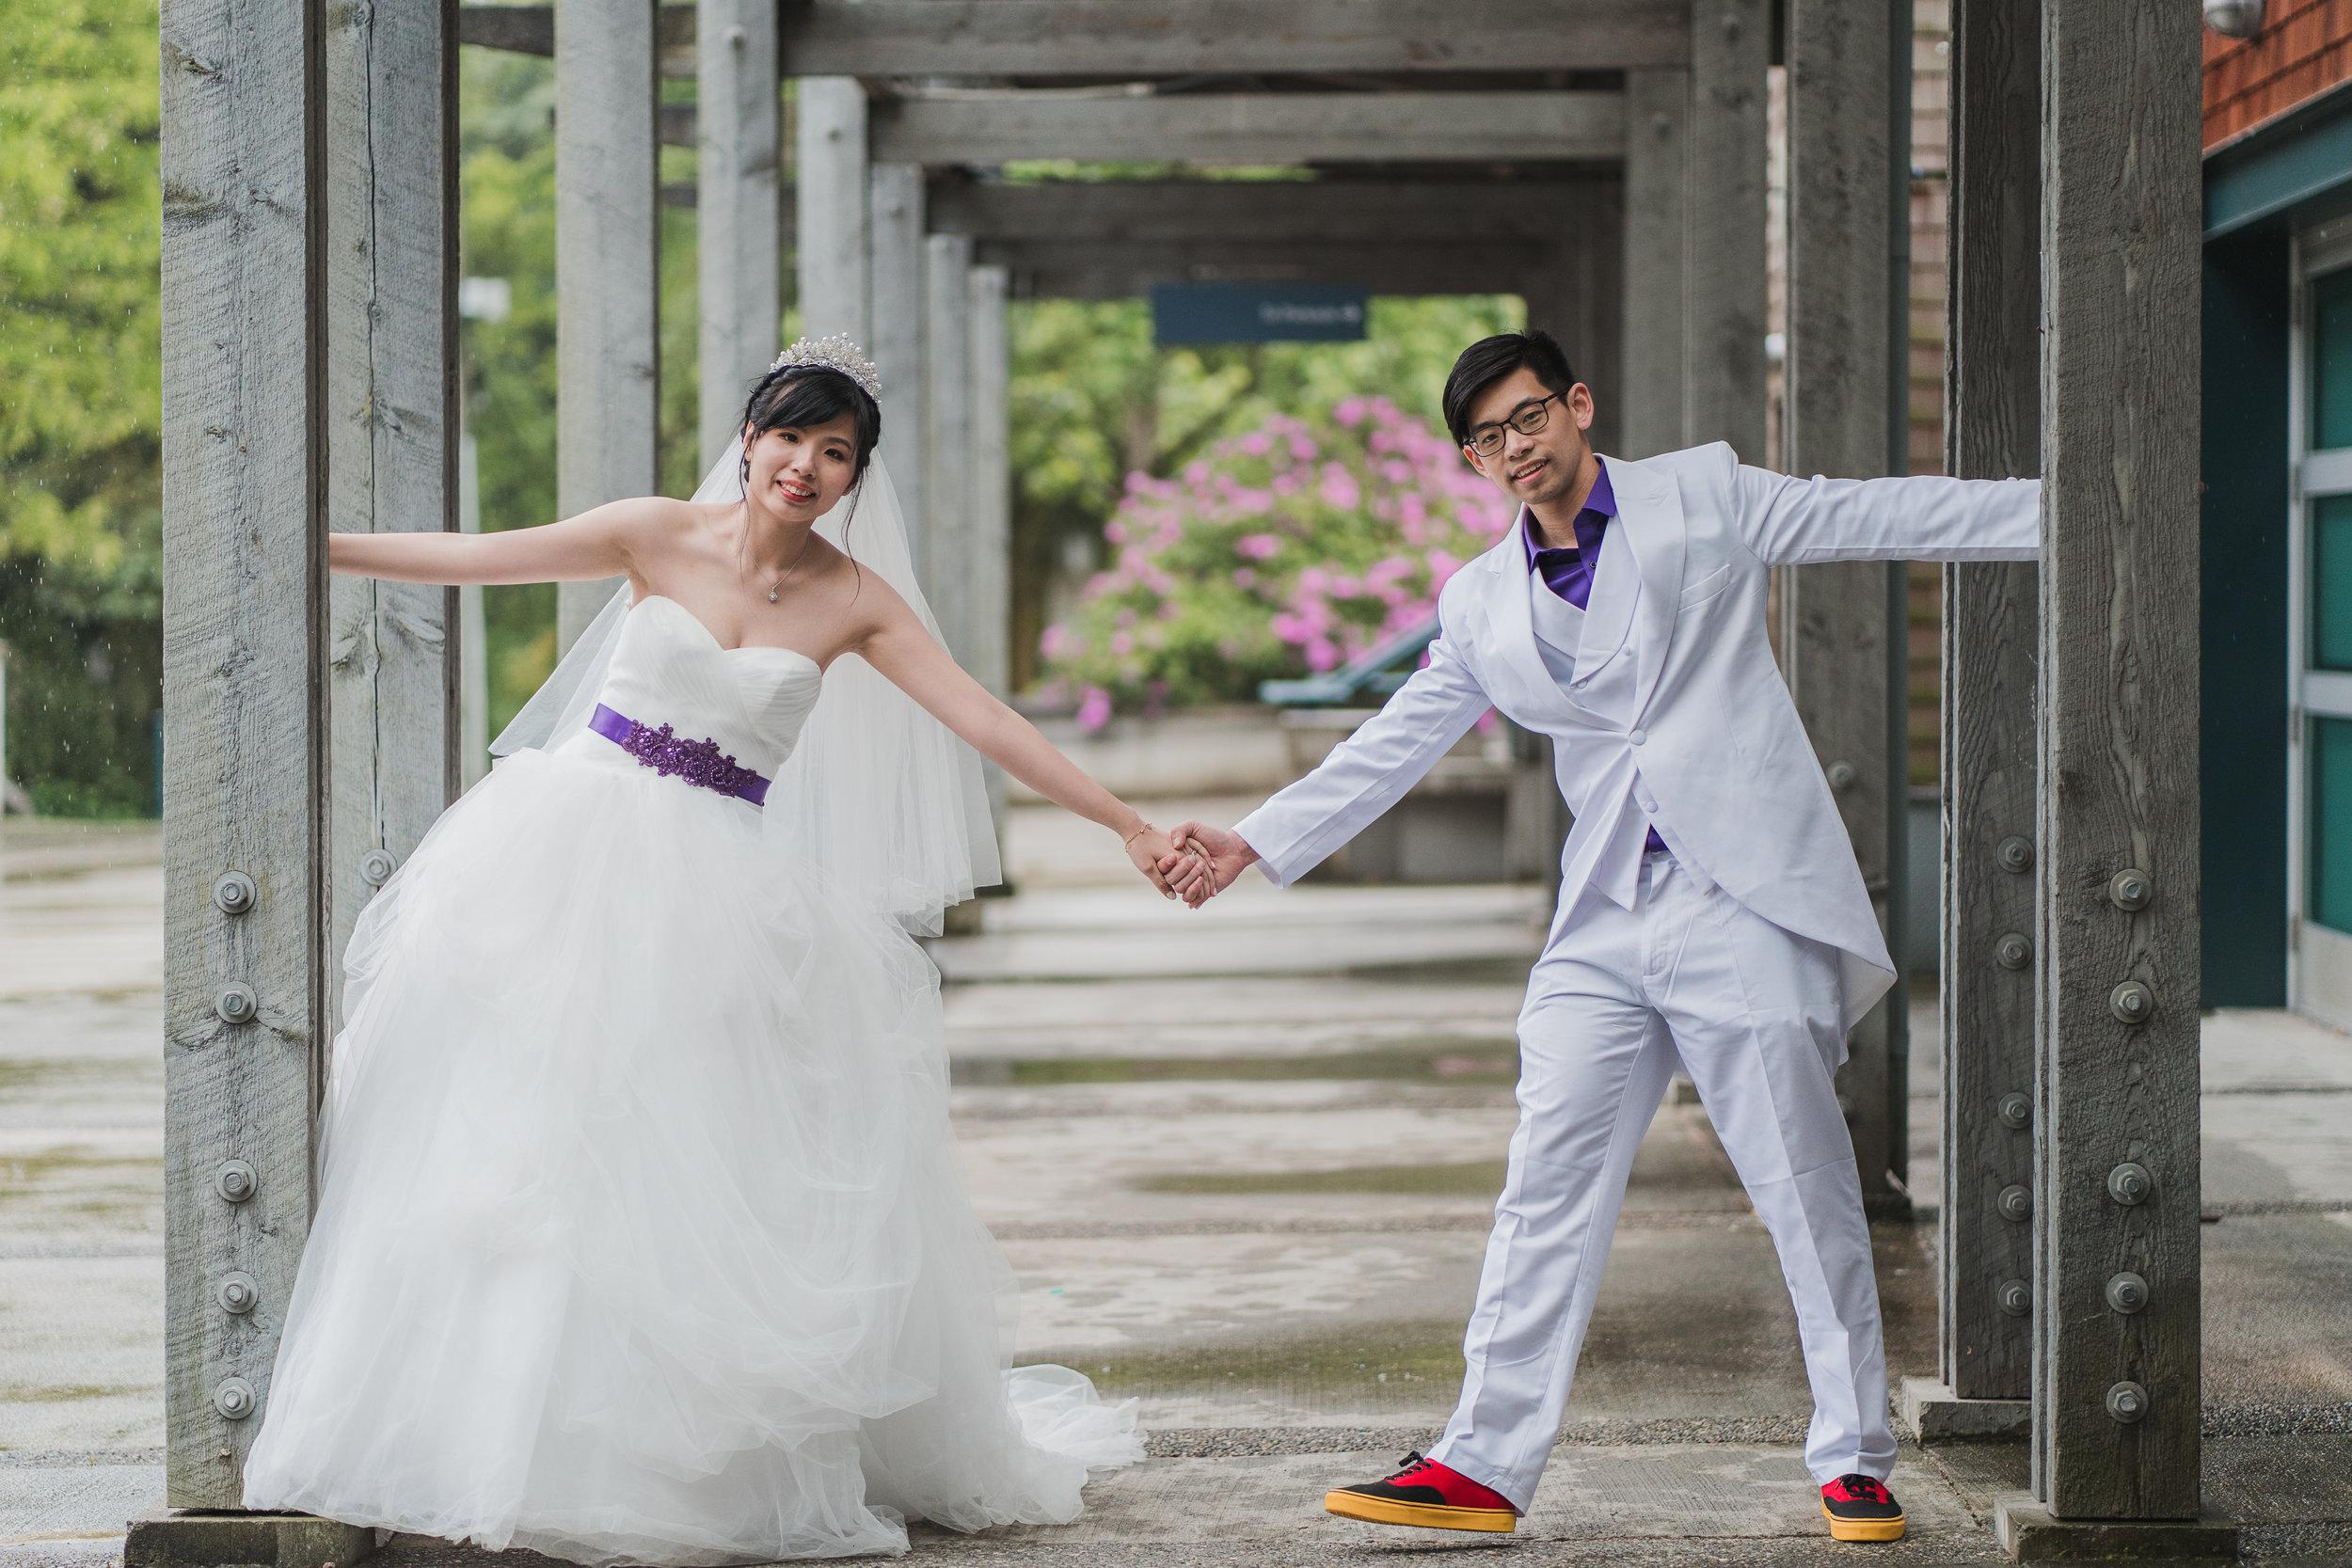 20190520 - Pamela & Matthew Wedding - 0230.jpg